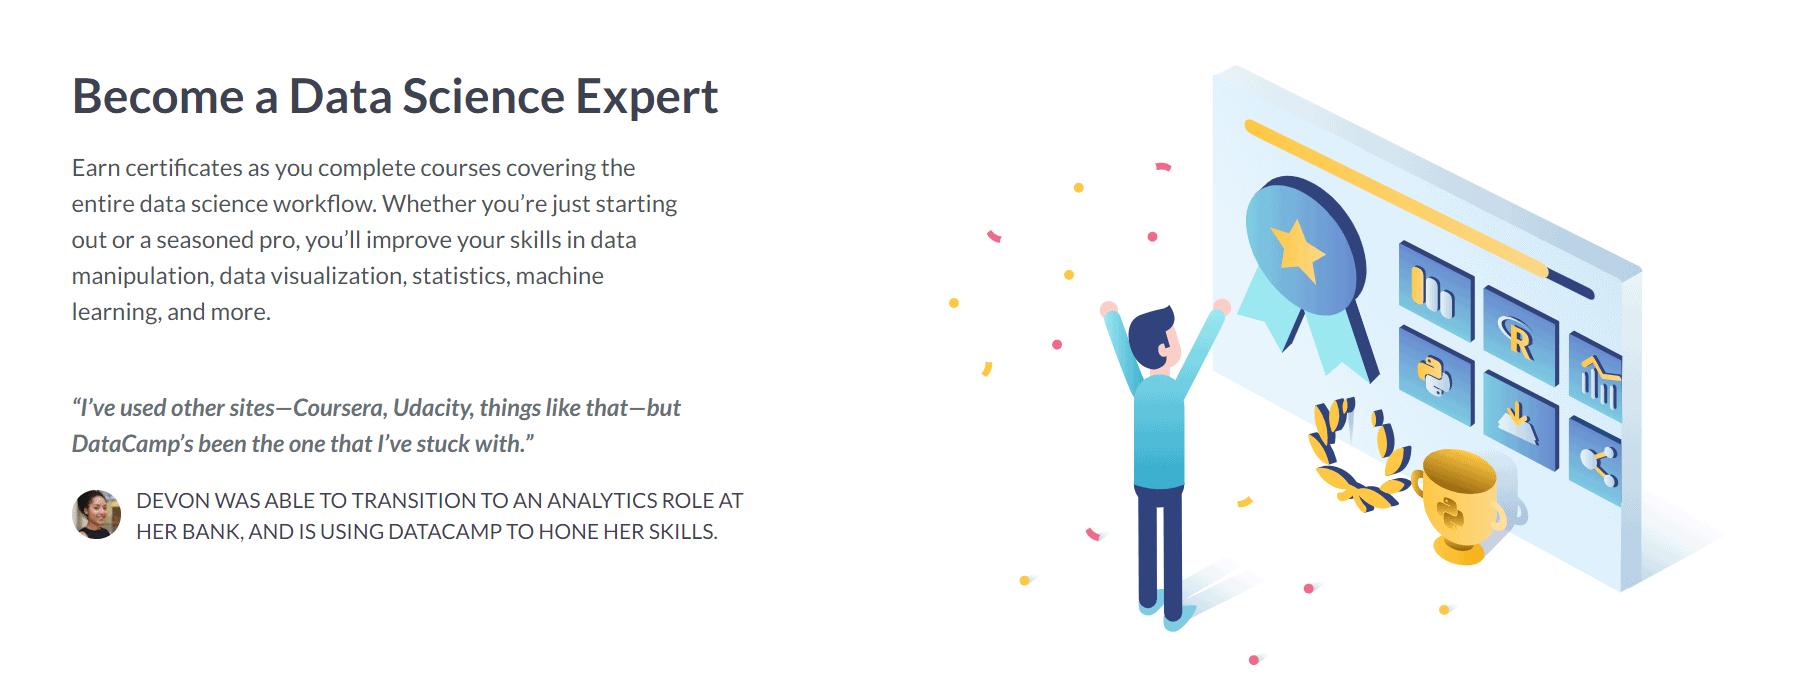 DataCamp Review- Data Science Expert